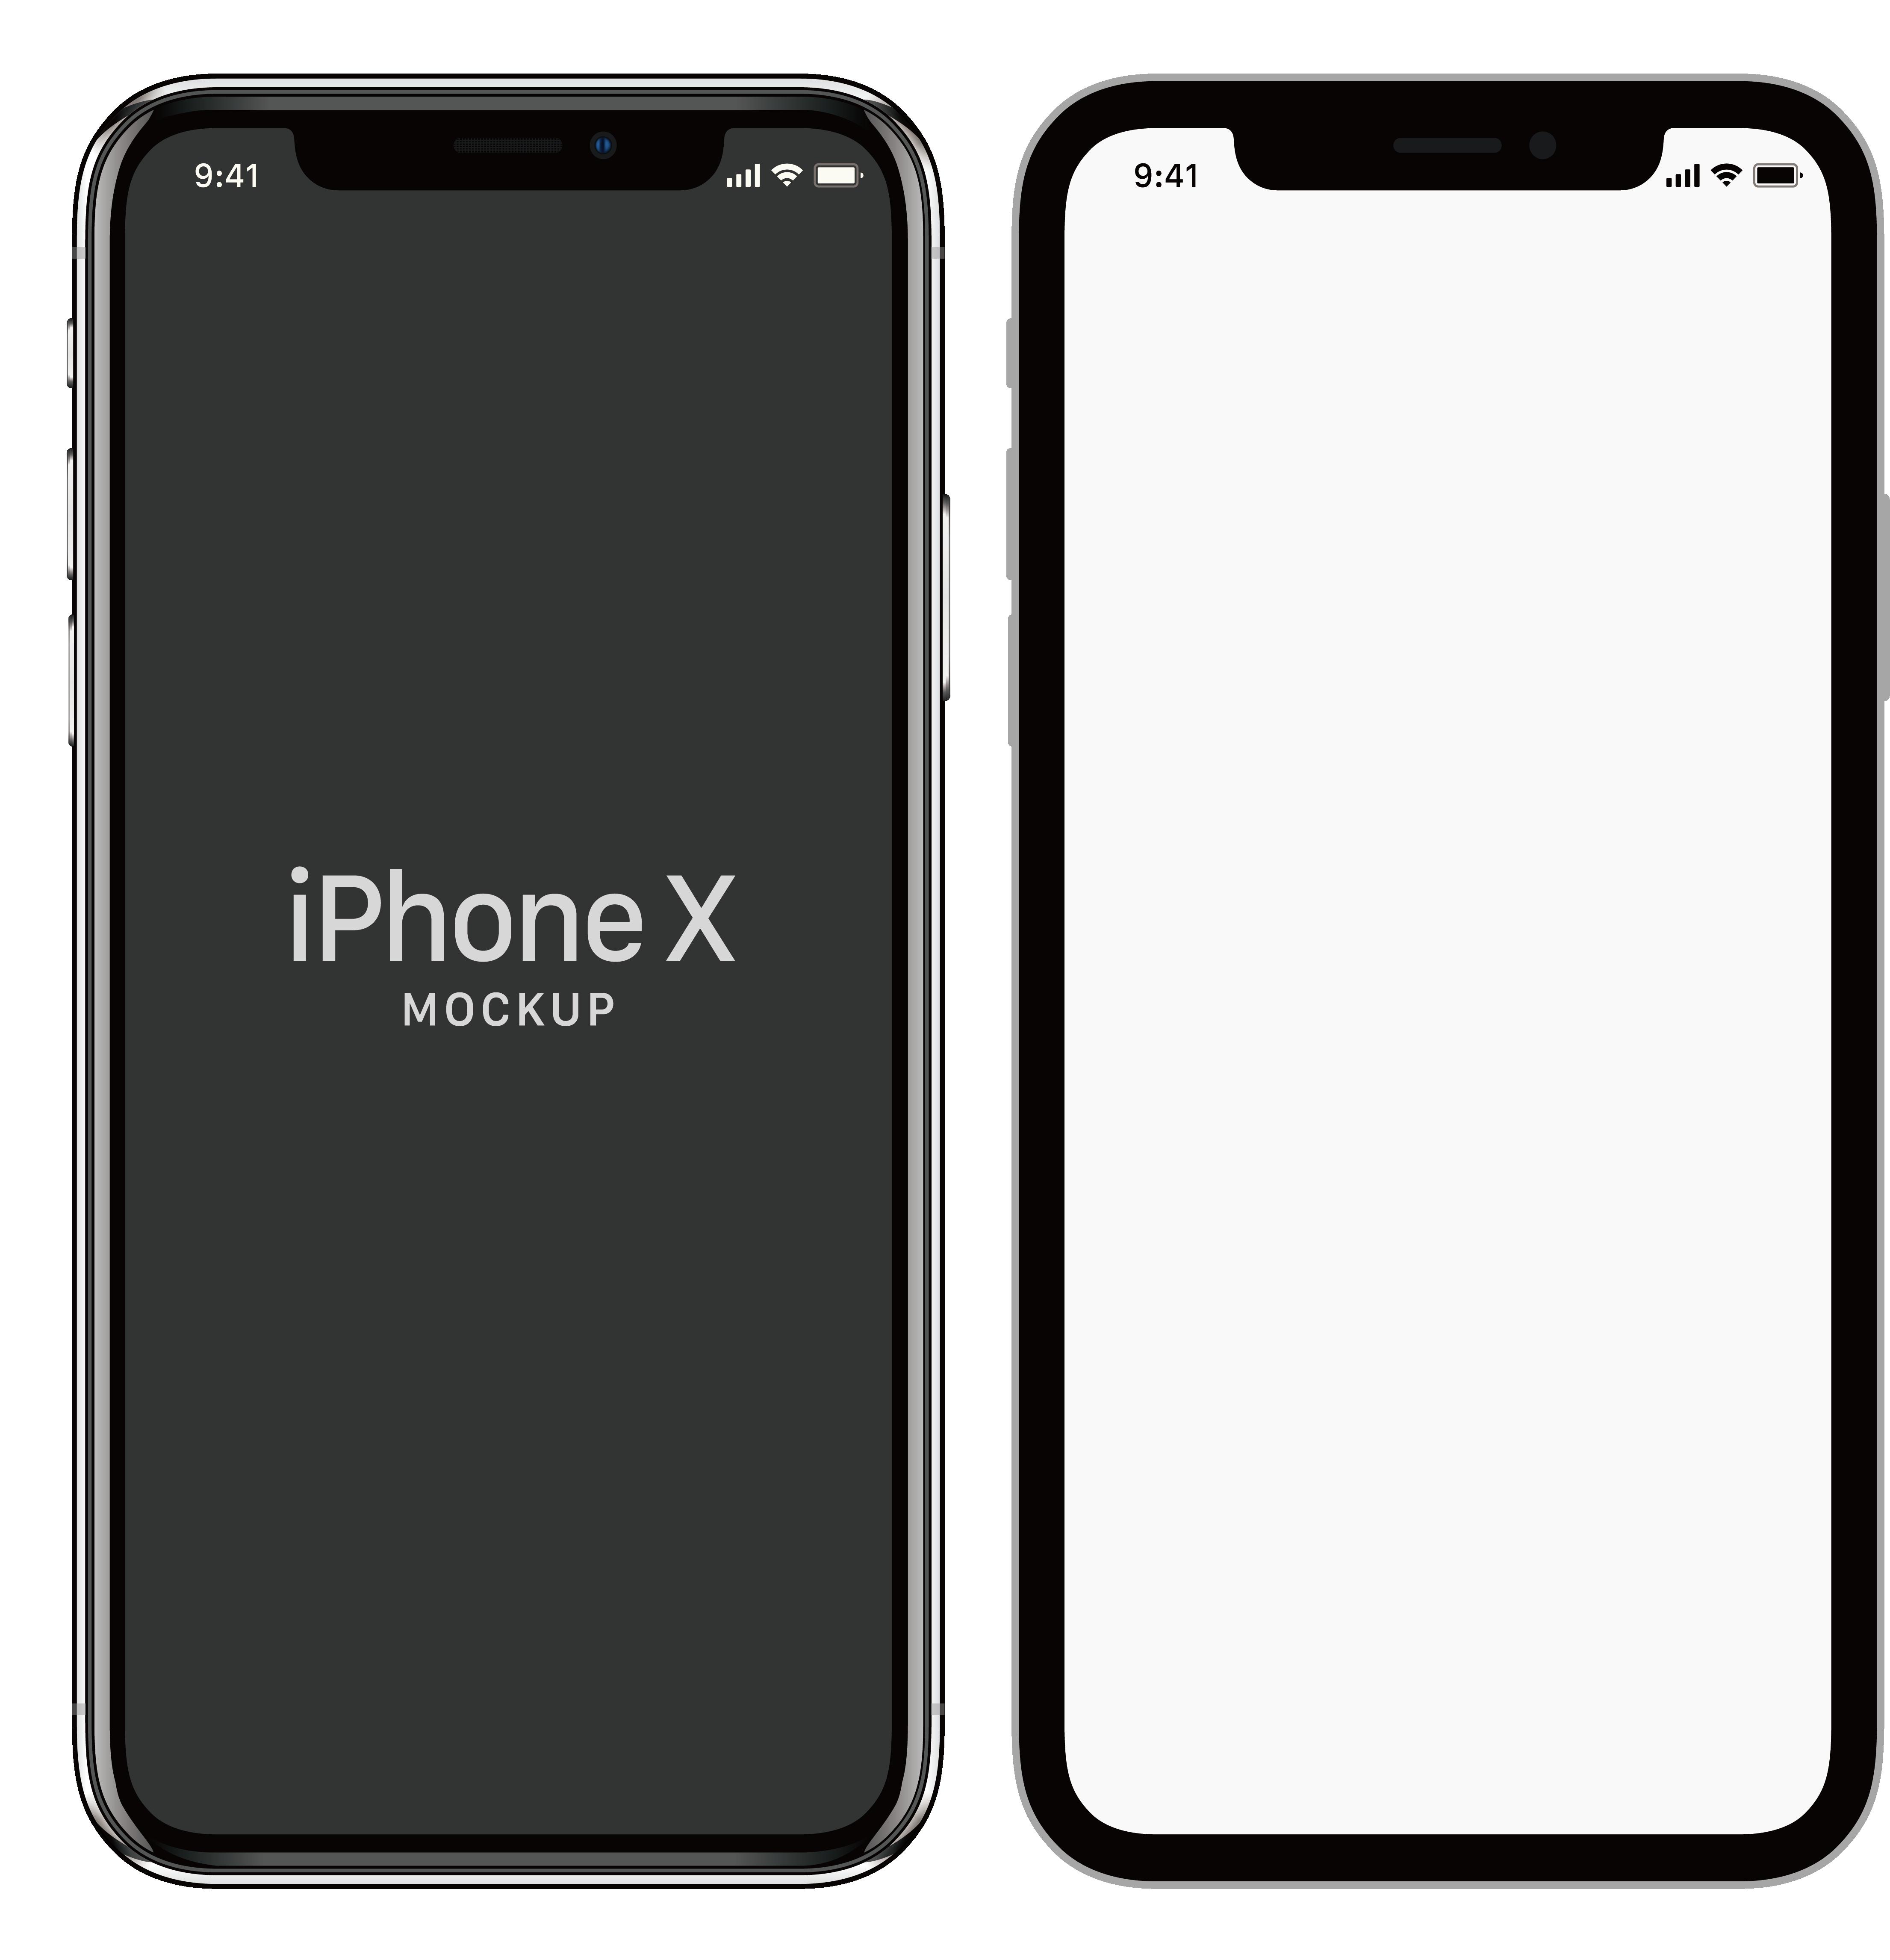 iPhone X iPhone 6 Smartphone Apple.